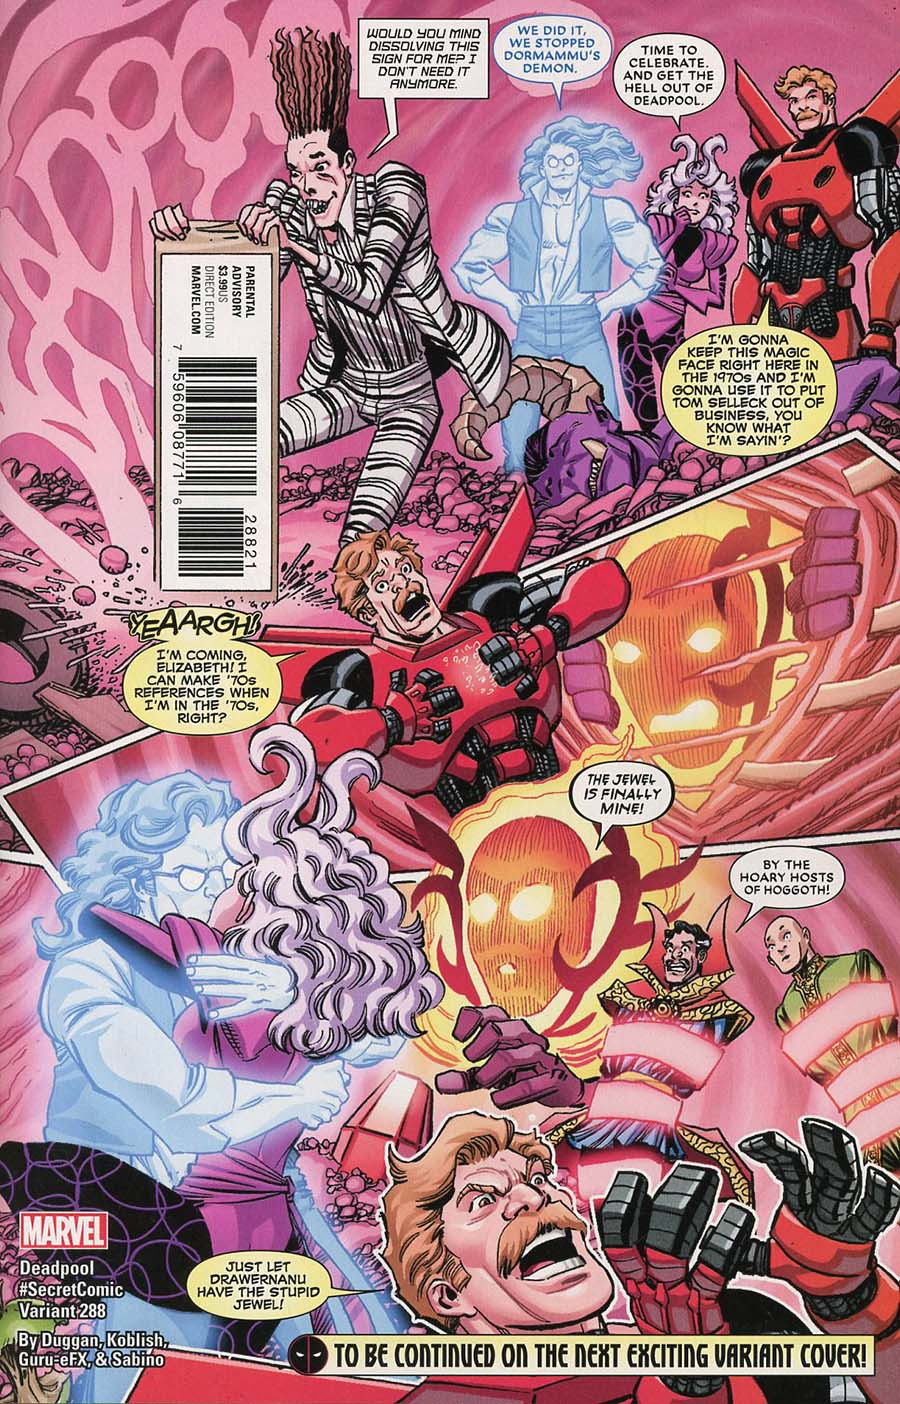 Despicable Deadpool #288 Cover B Variant Scott Koblish Secret Comic Cover (Marvel Legacy Tie-In)